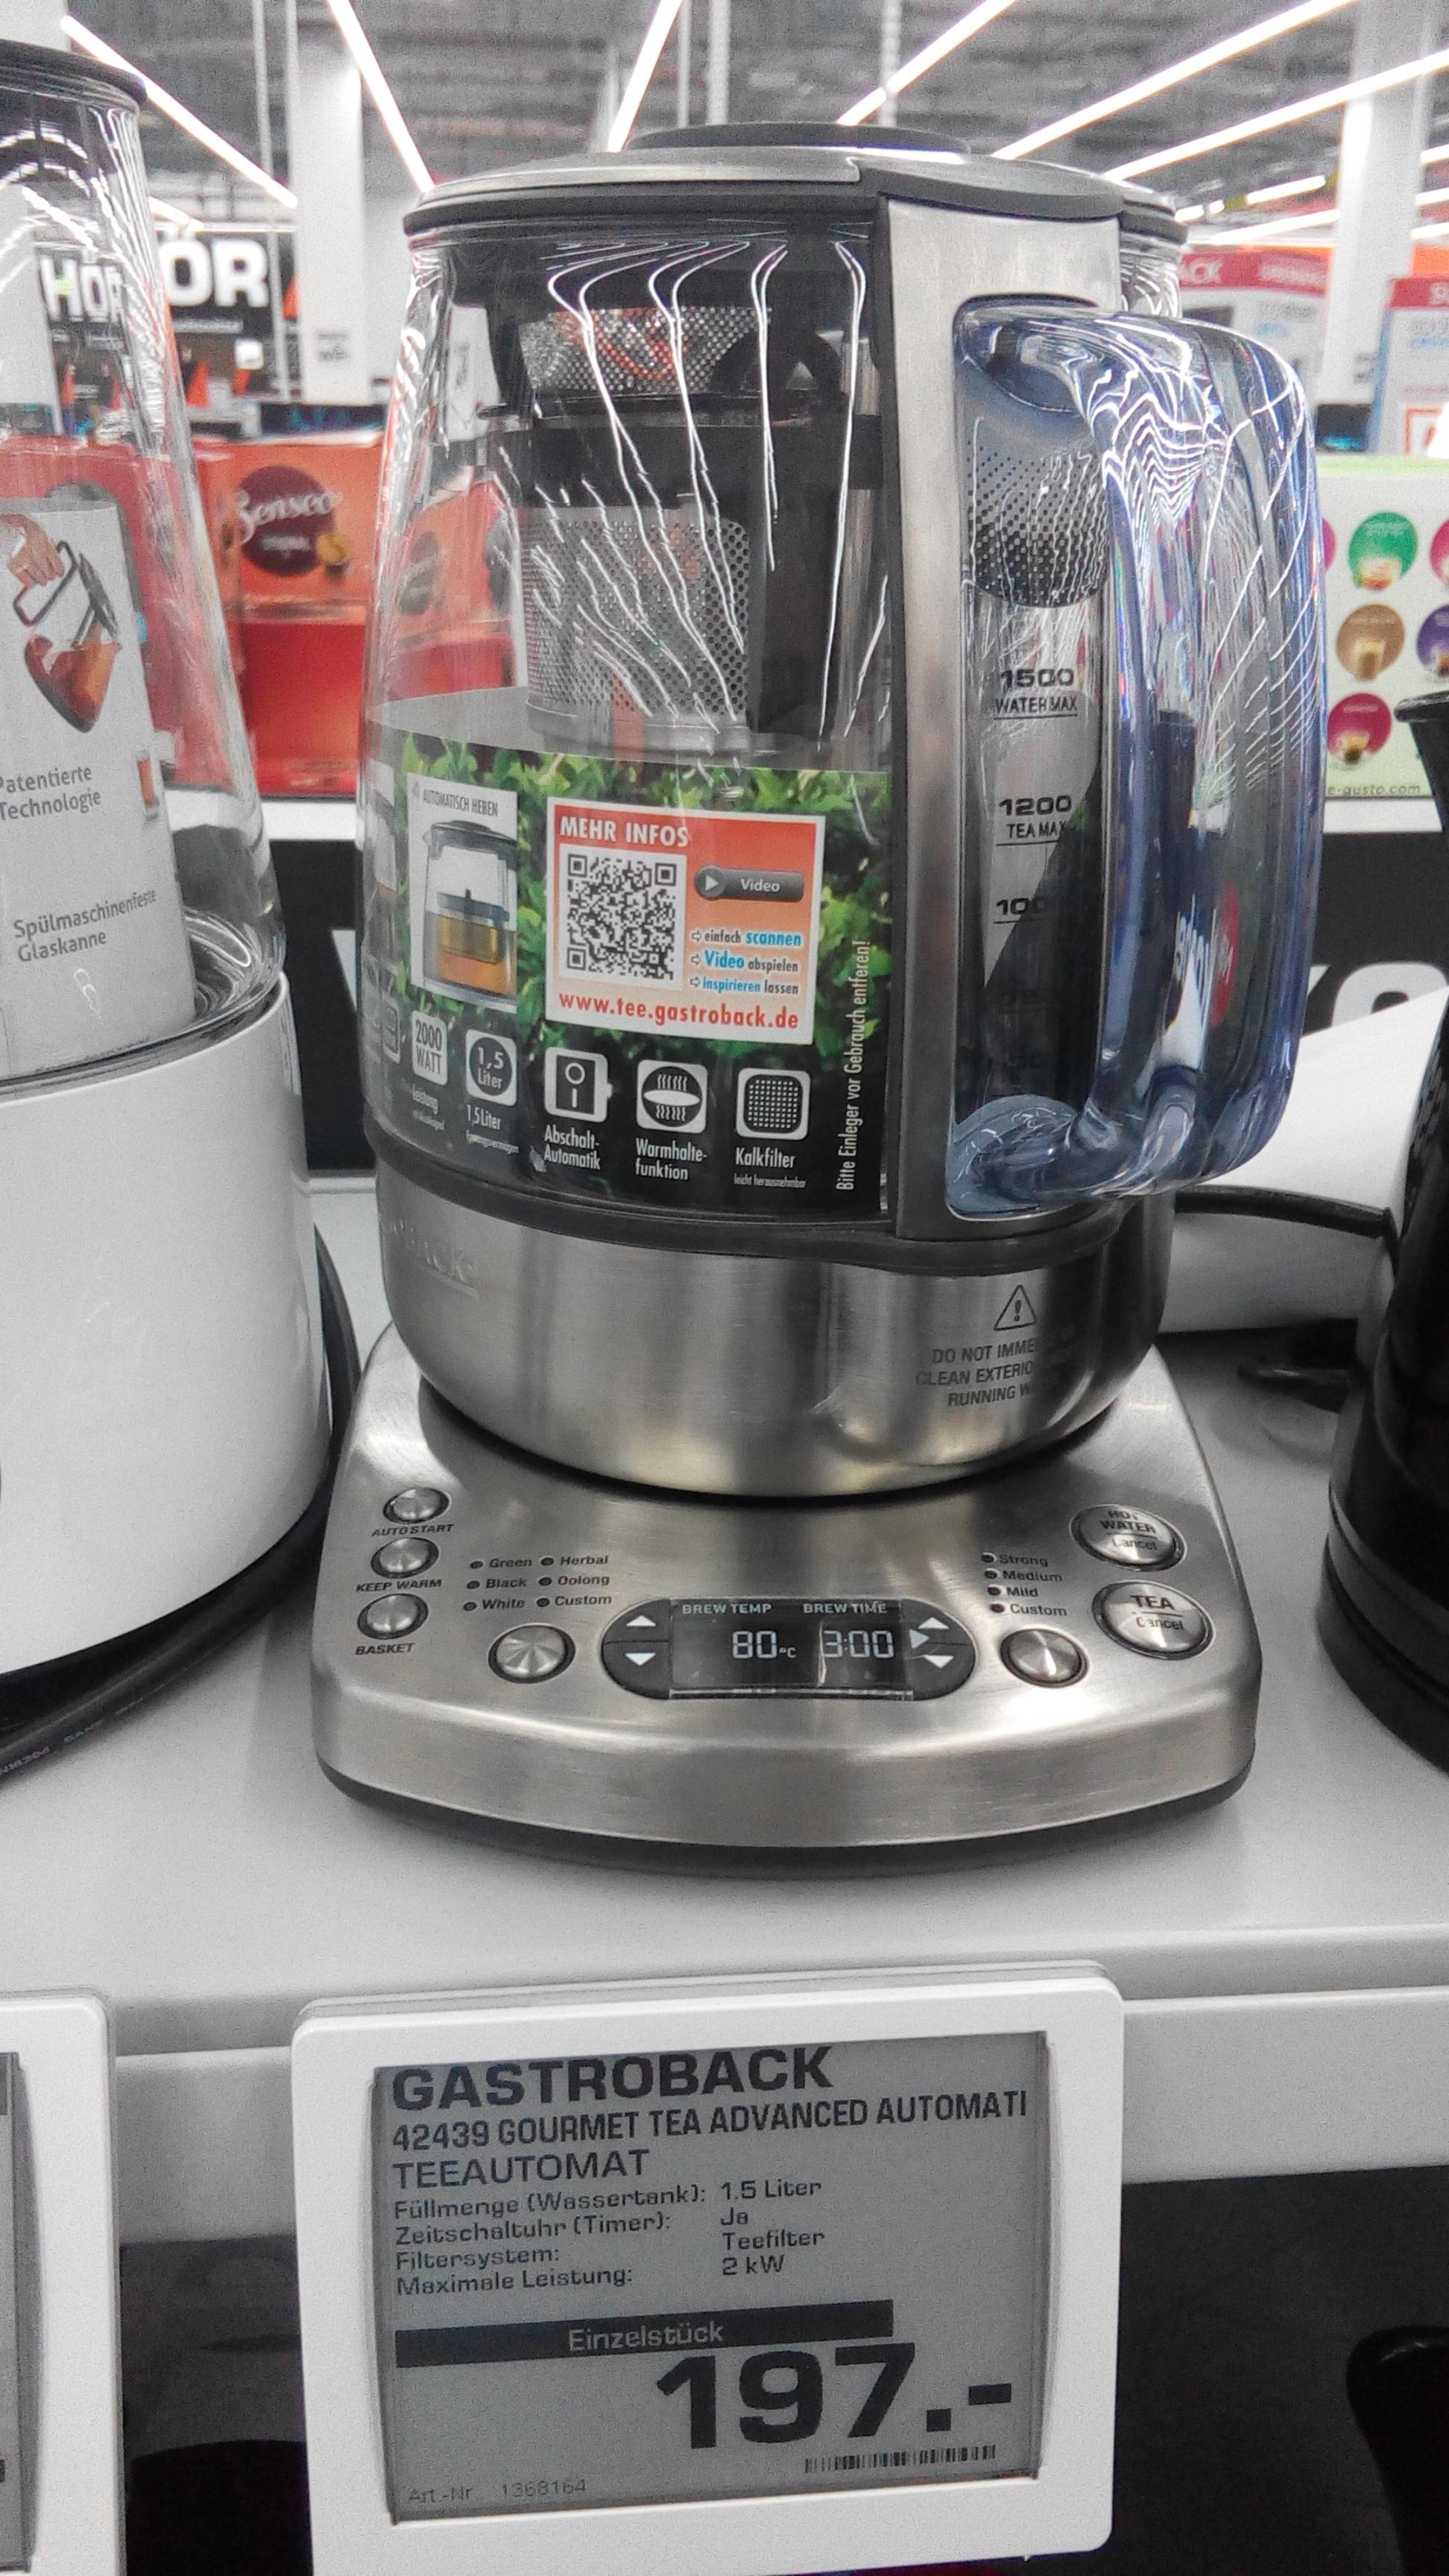 [Lokal Saturn Gummersbach] Teeautomat Gastroback 42439 Gourmet Tea Advanced Automatic